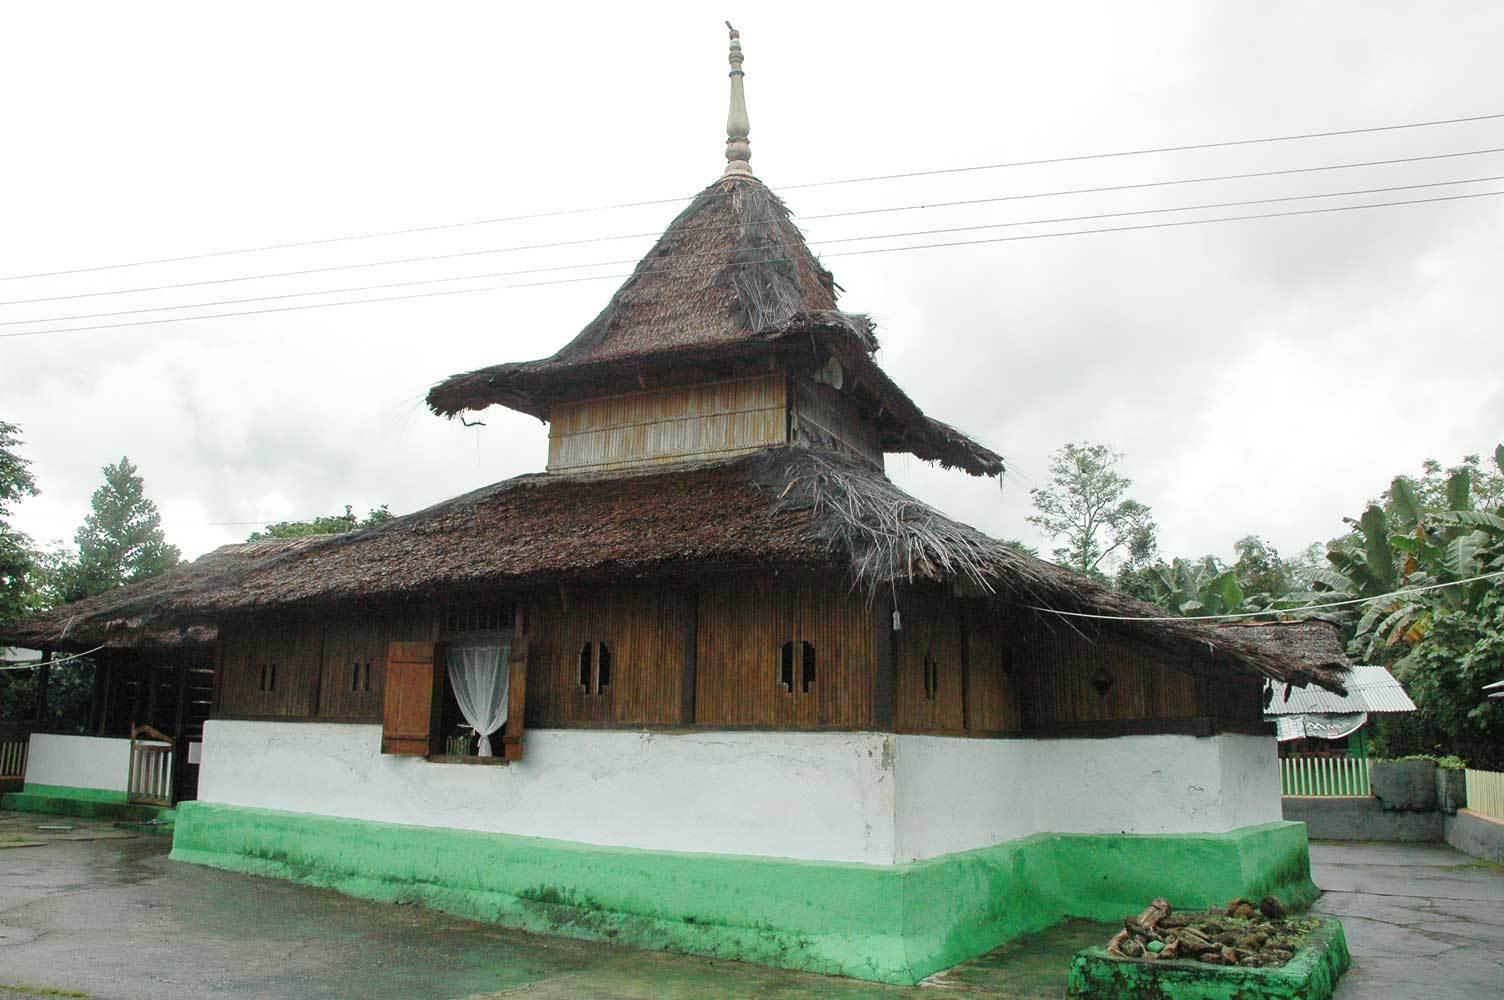 9 Masjid Tertua Indonesia Bersejarah Saka Tunggal Berdiri Sebelum Walisongo